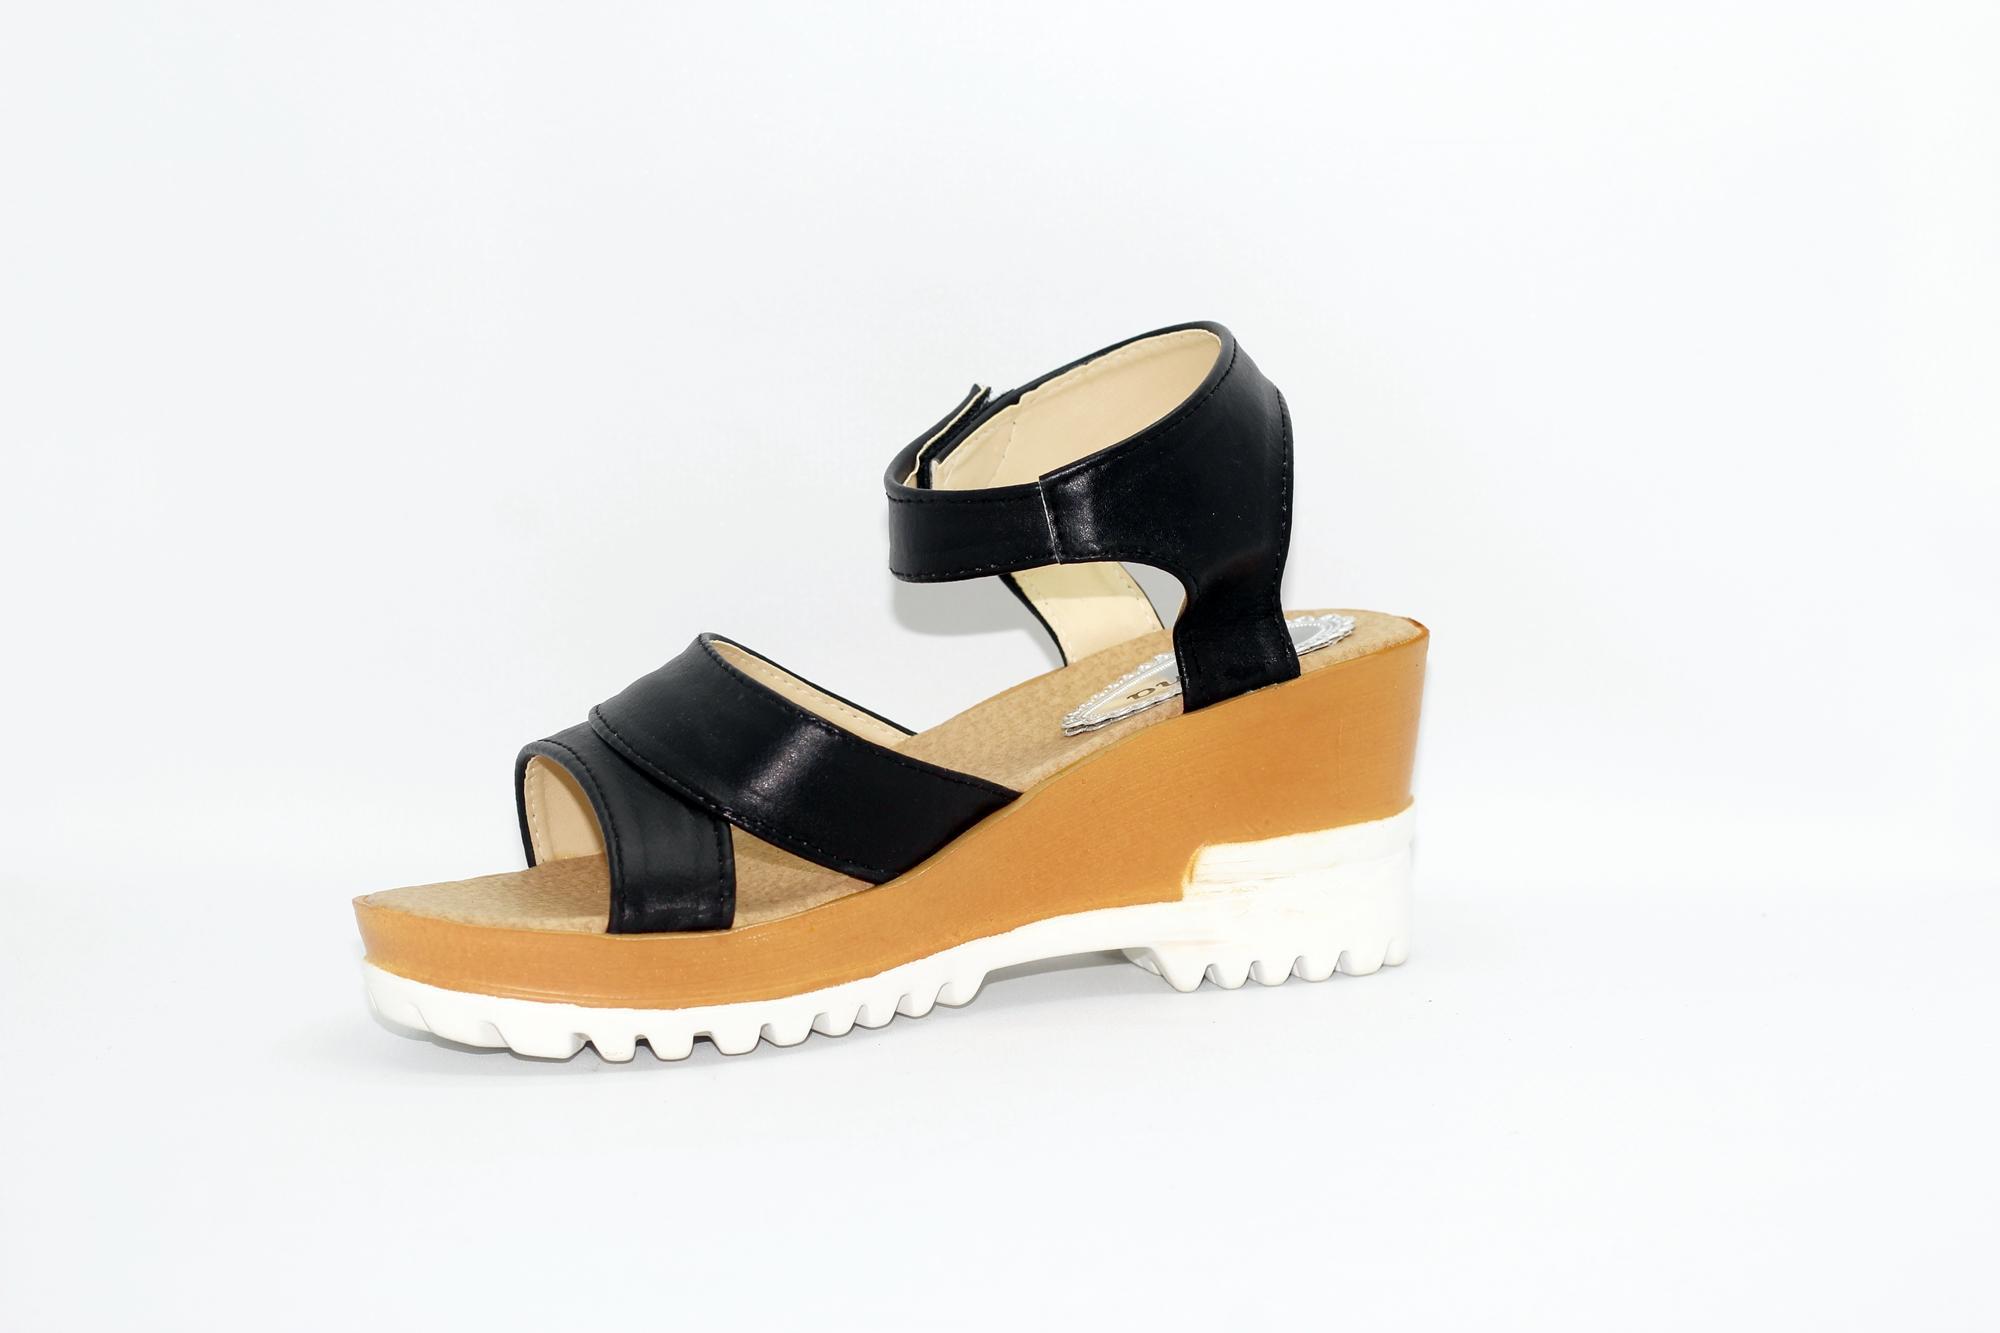 Ginshashop - Sepatu Wanita Wedges Alexa GWS-1176 Sandal Wedges Murah sendal wedges / wedges